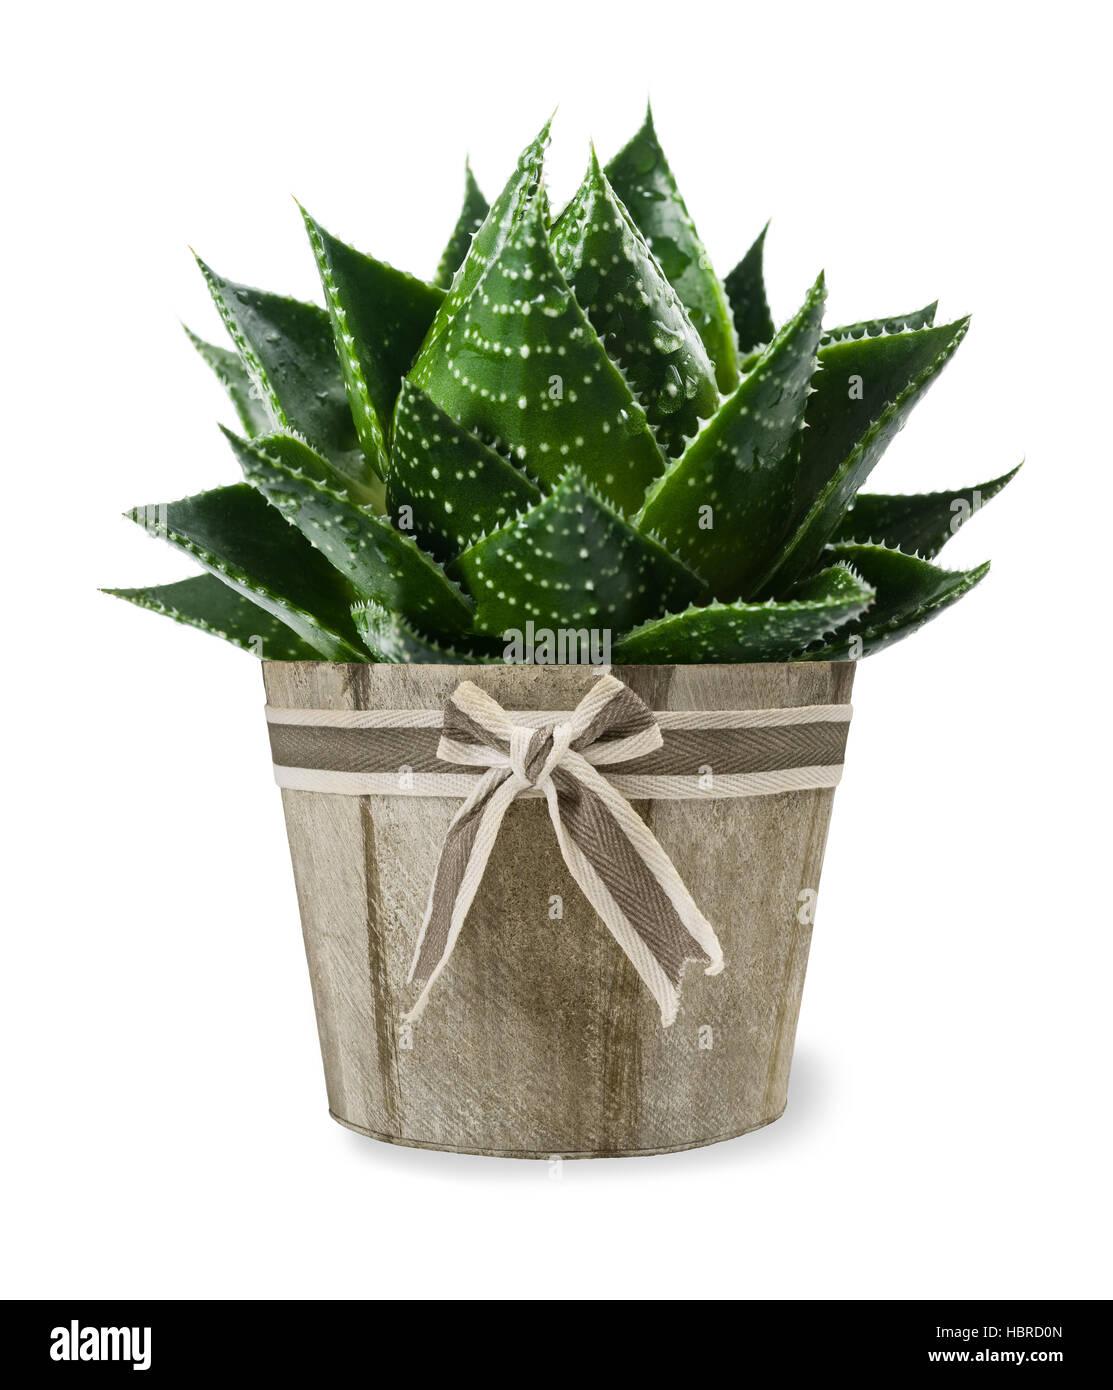 Aloe vera plant in vase isolated on white Stock Photo